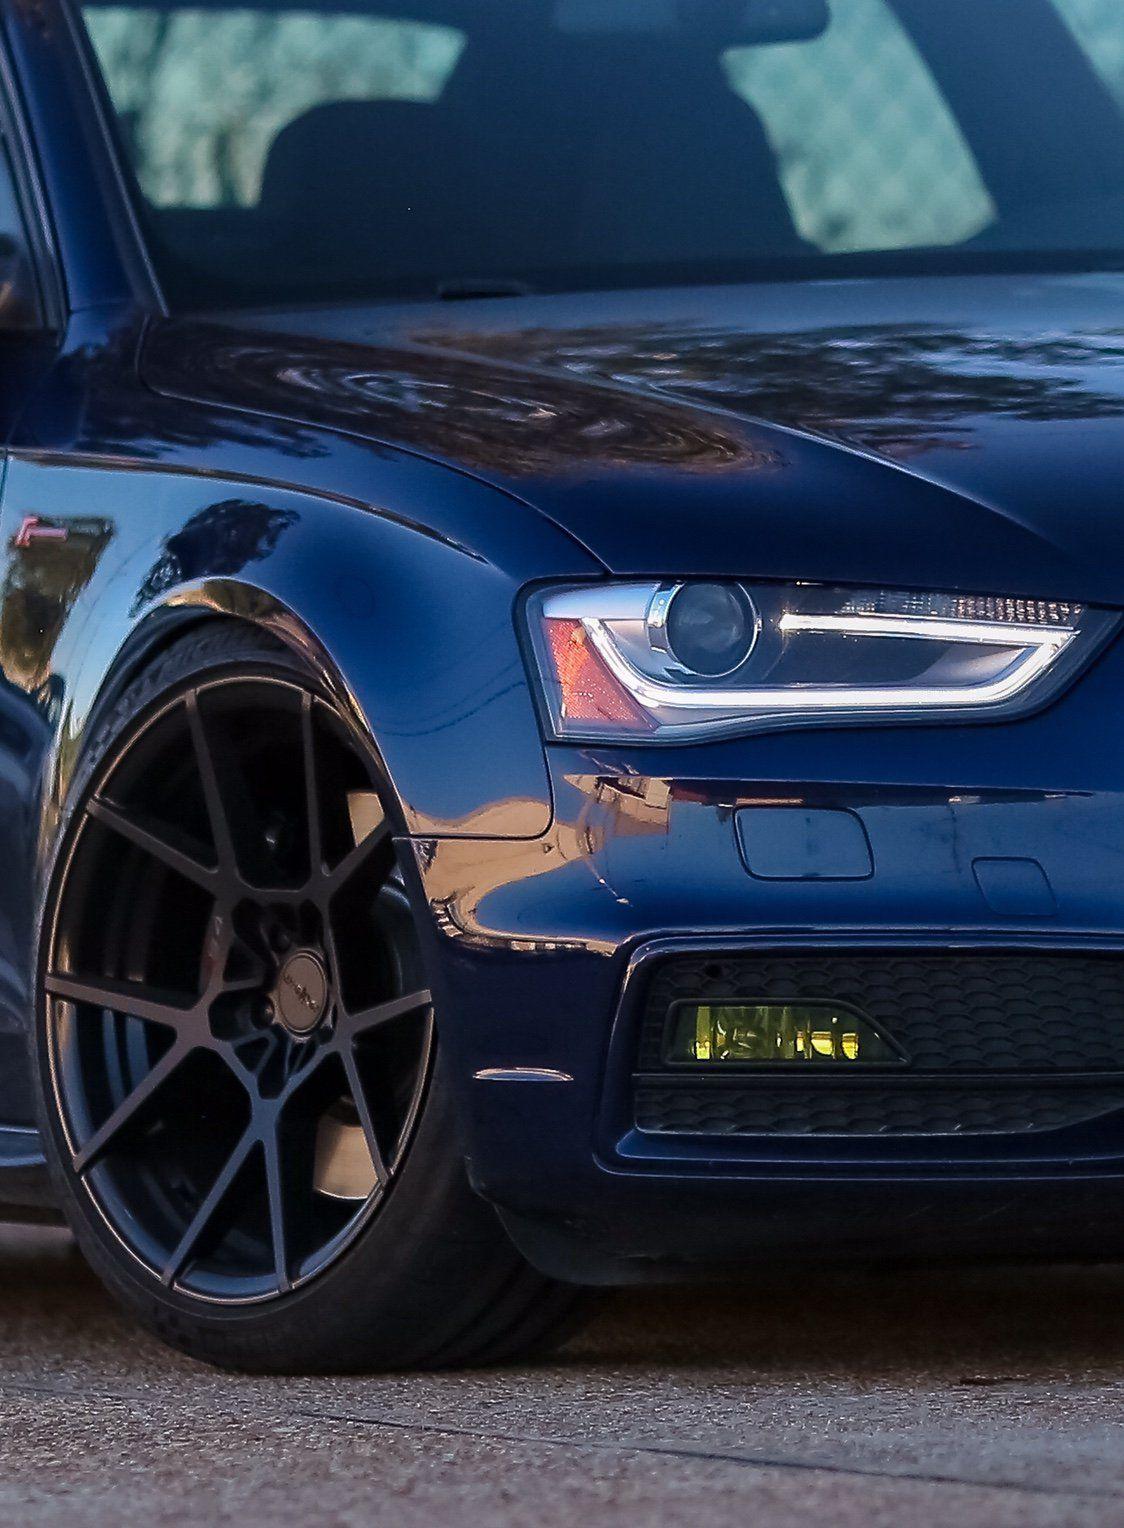 Post Your Modded Estoril Blue S4 B8 5 Estoril Blue Audi S4 Audi Rs4 B8